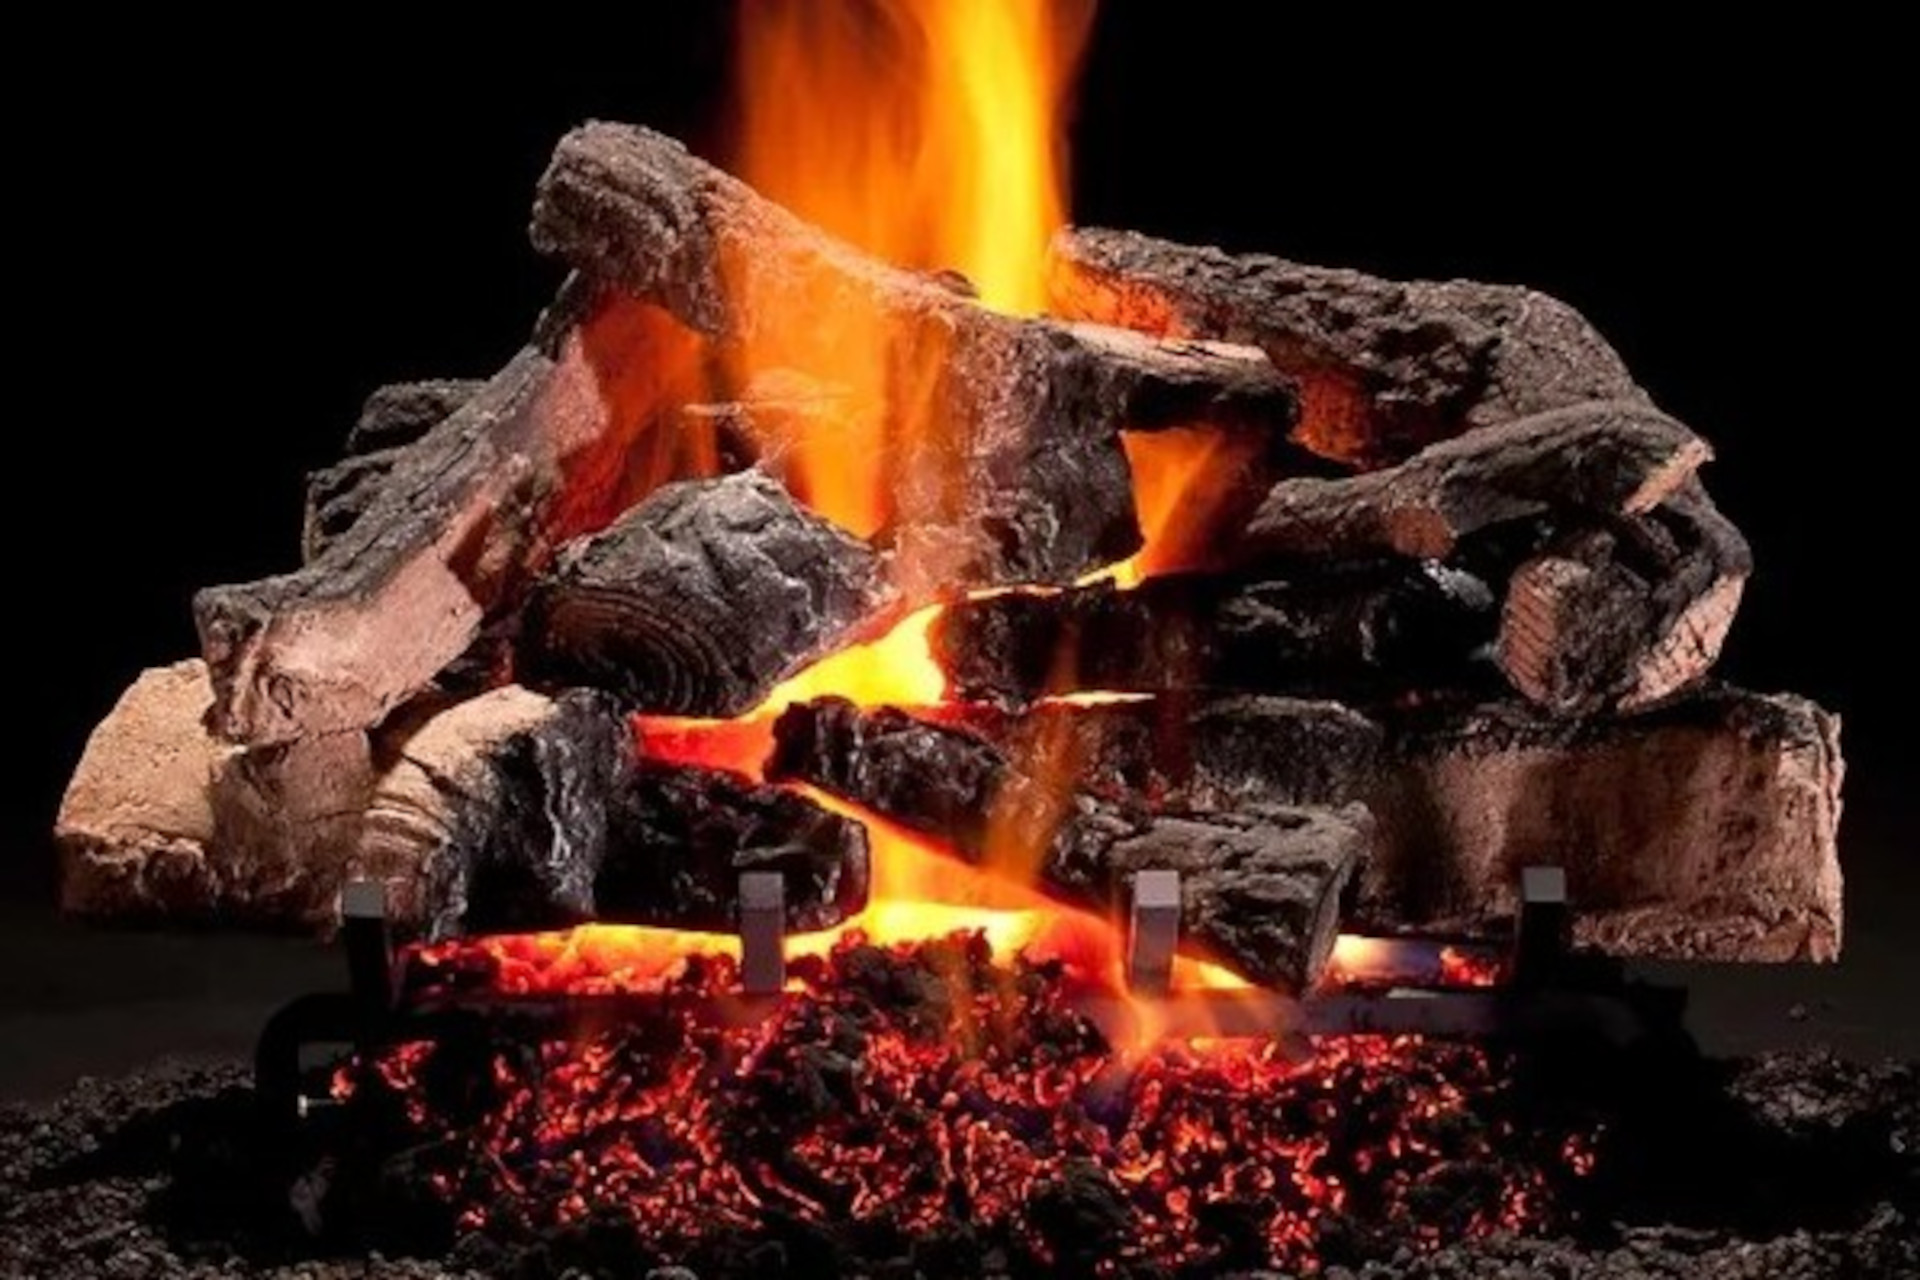 Hargrove Rustic Timbers Vented Gas Log Set